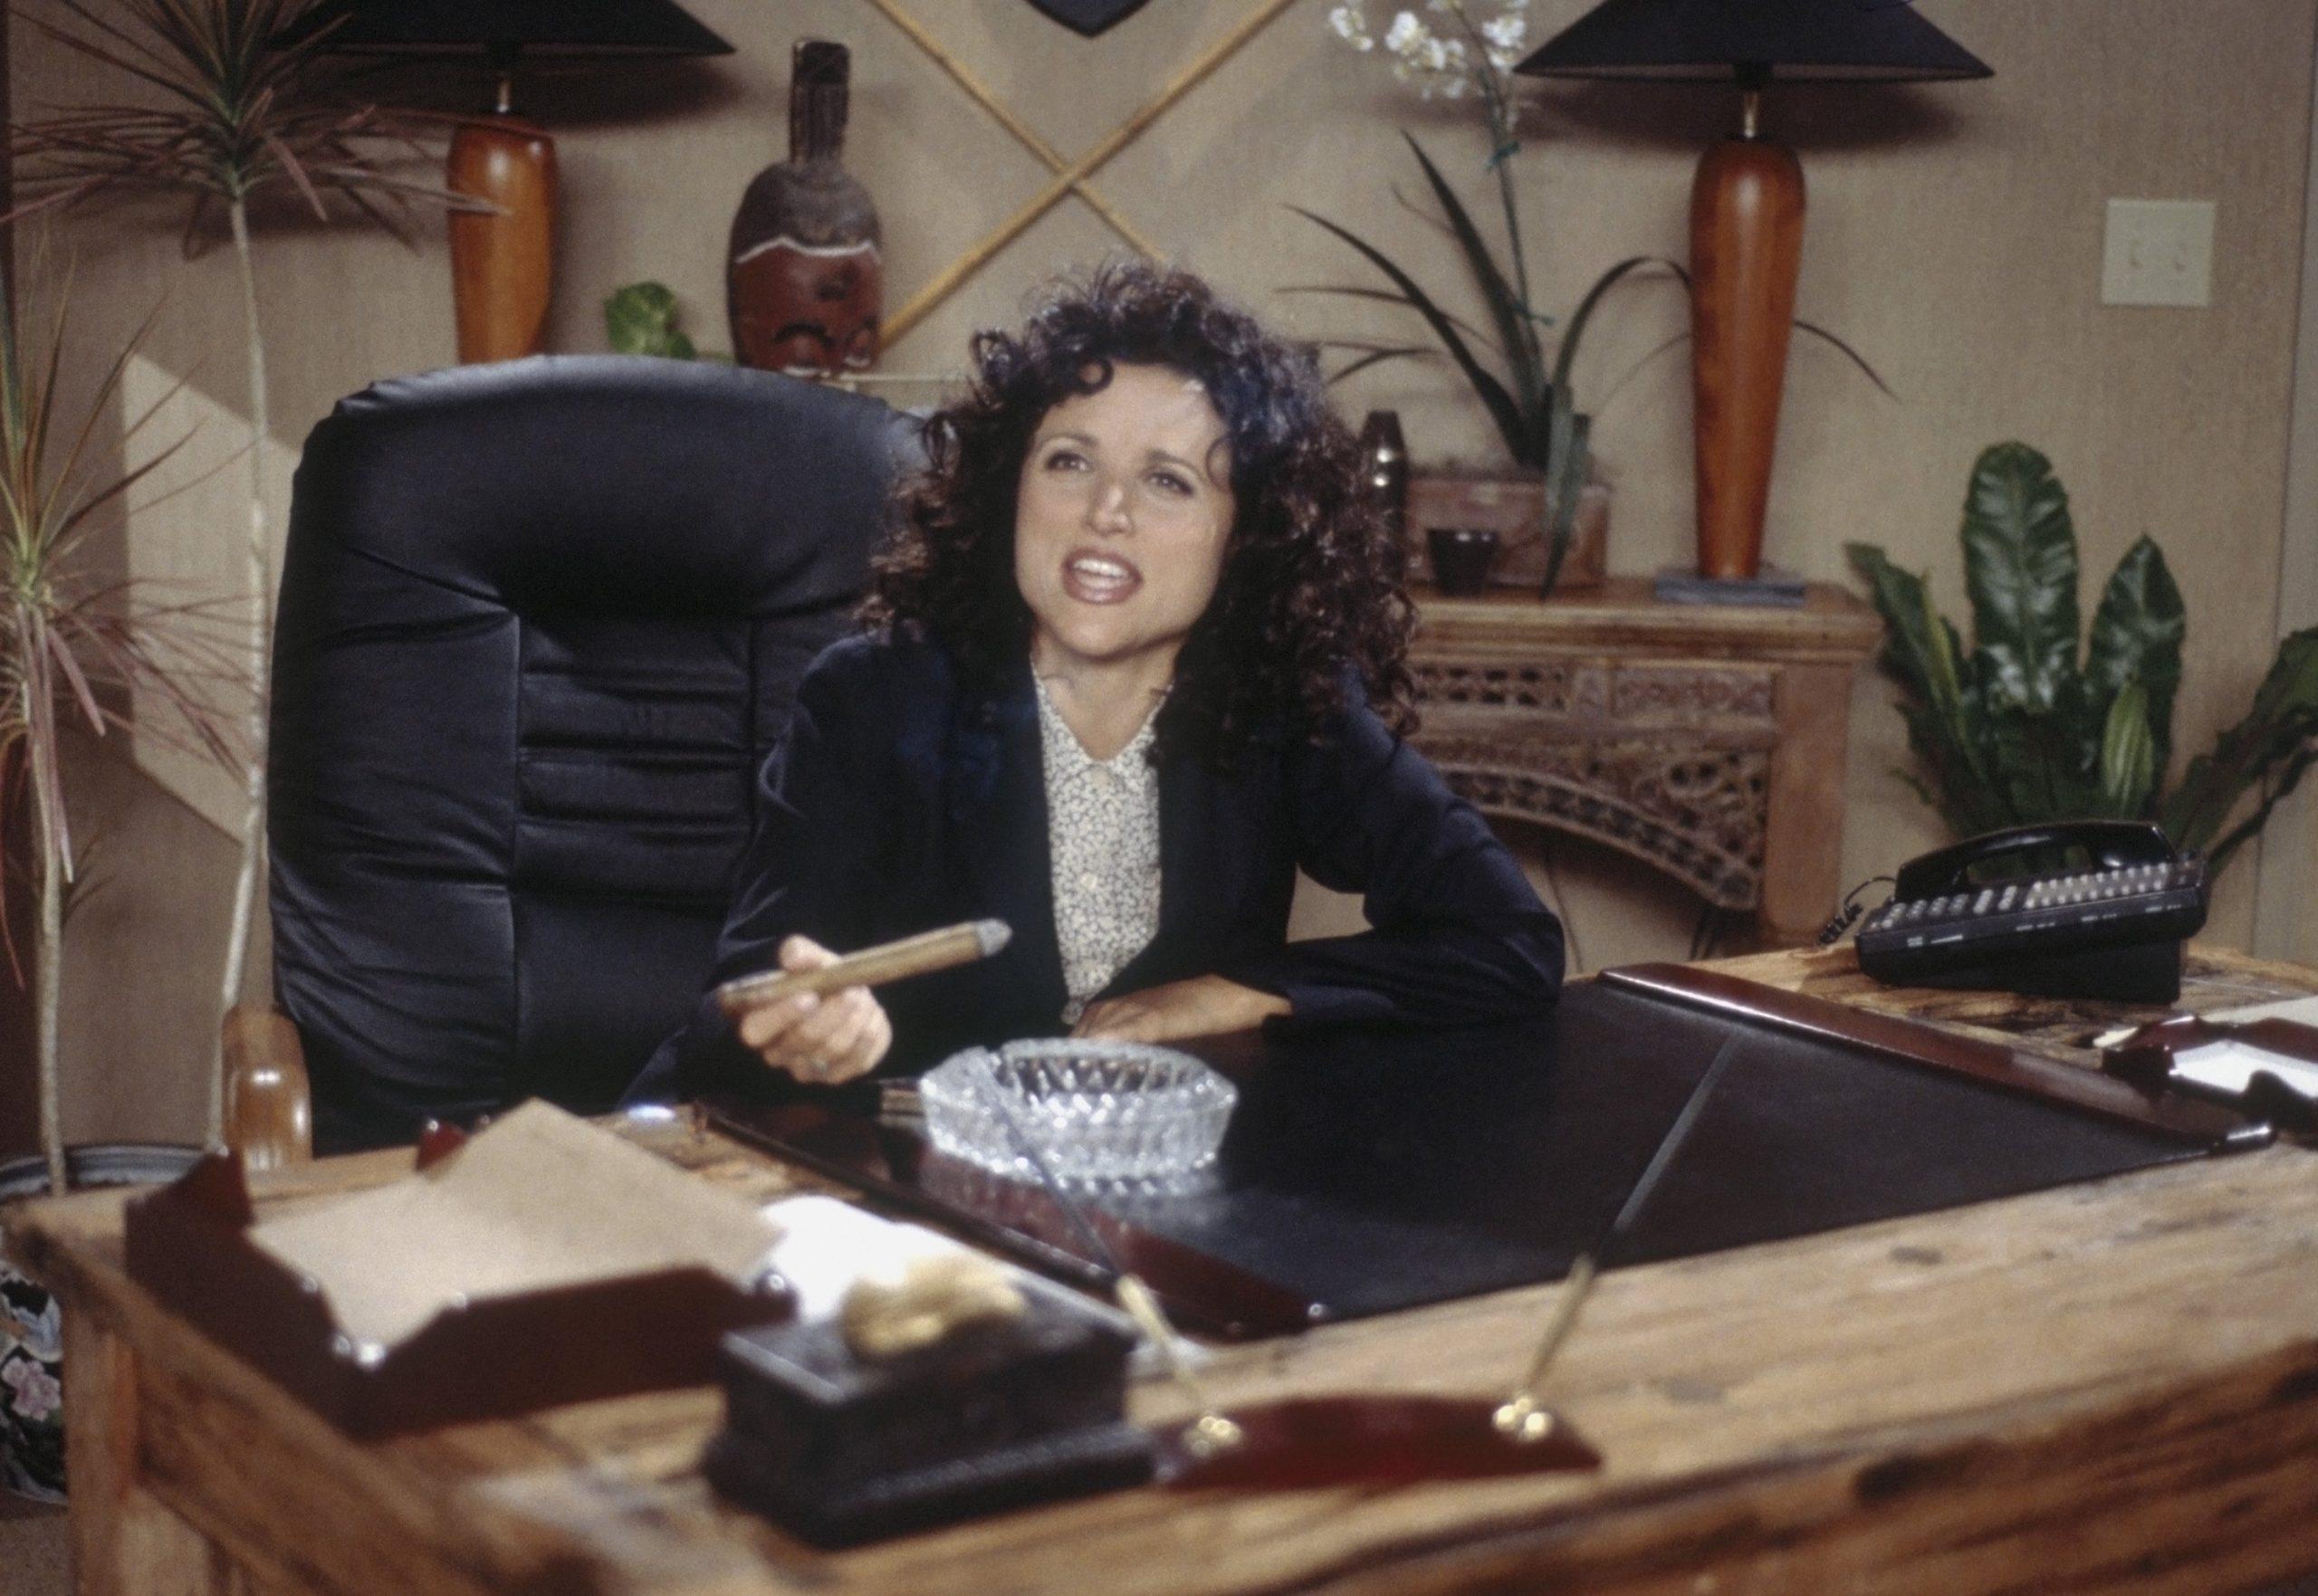 Elaine on Seinfeld